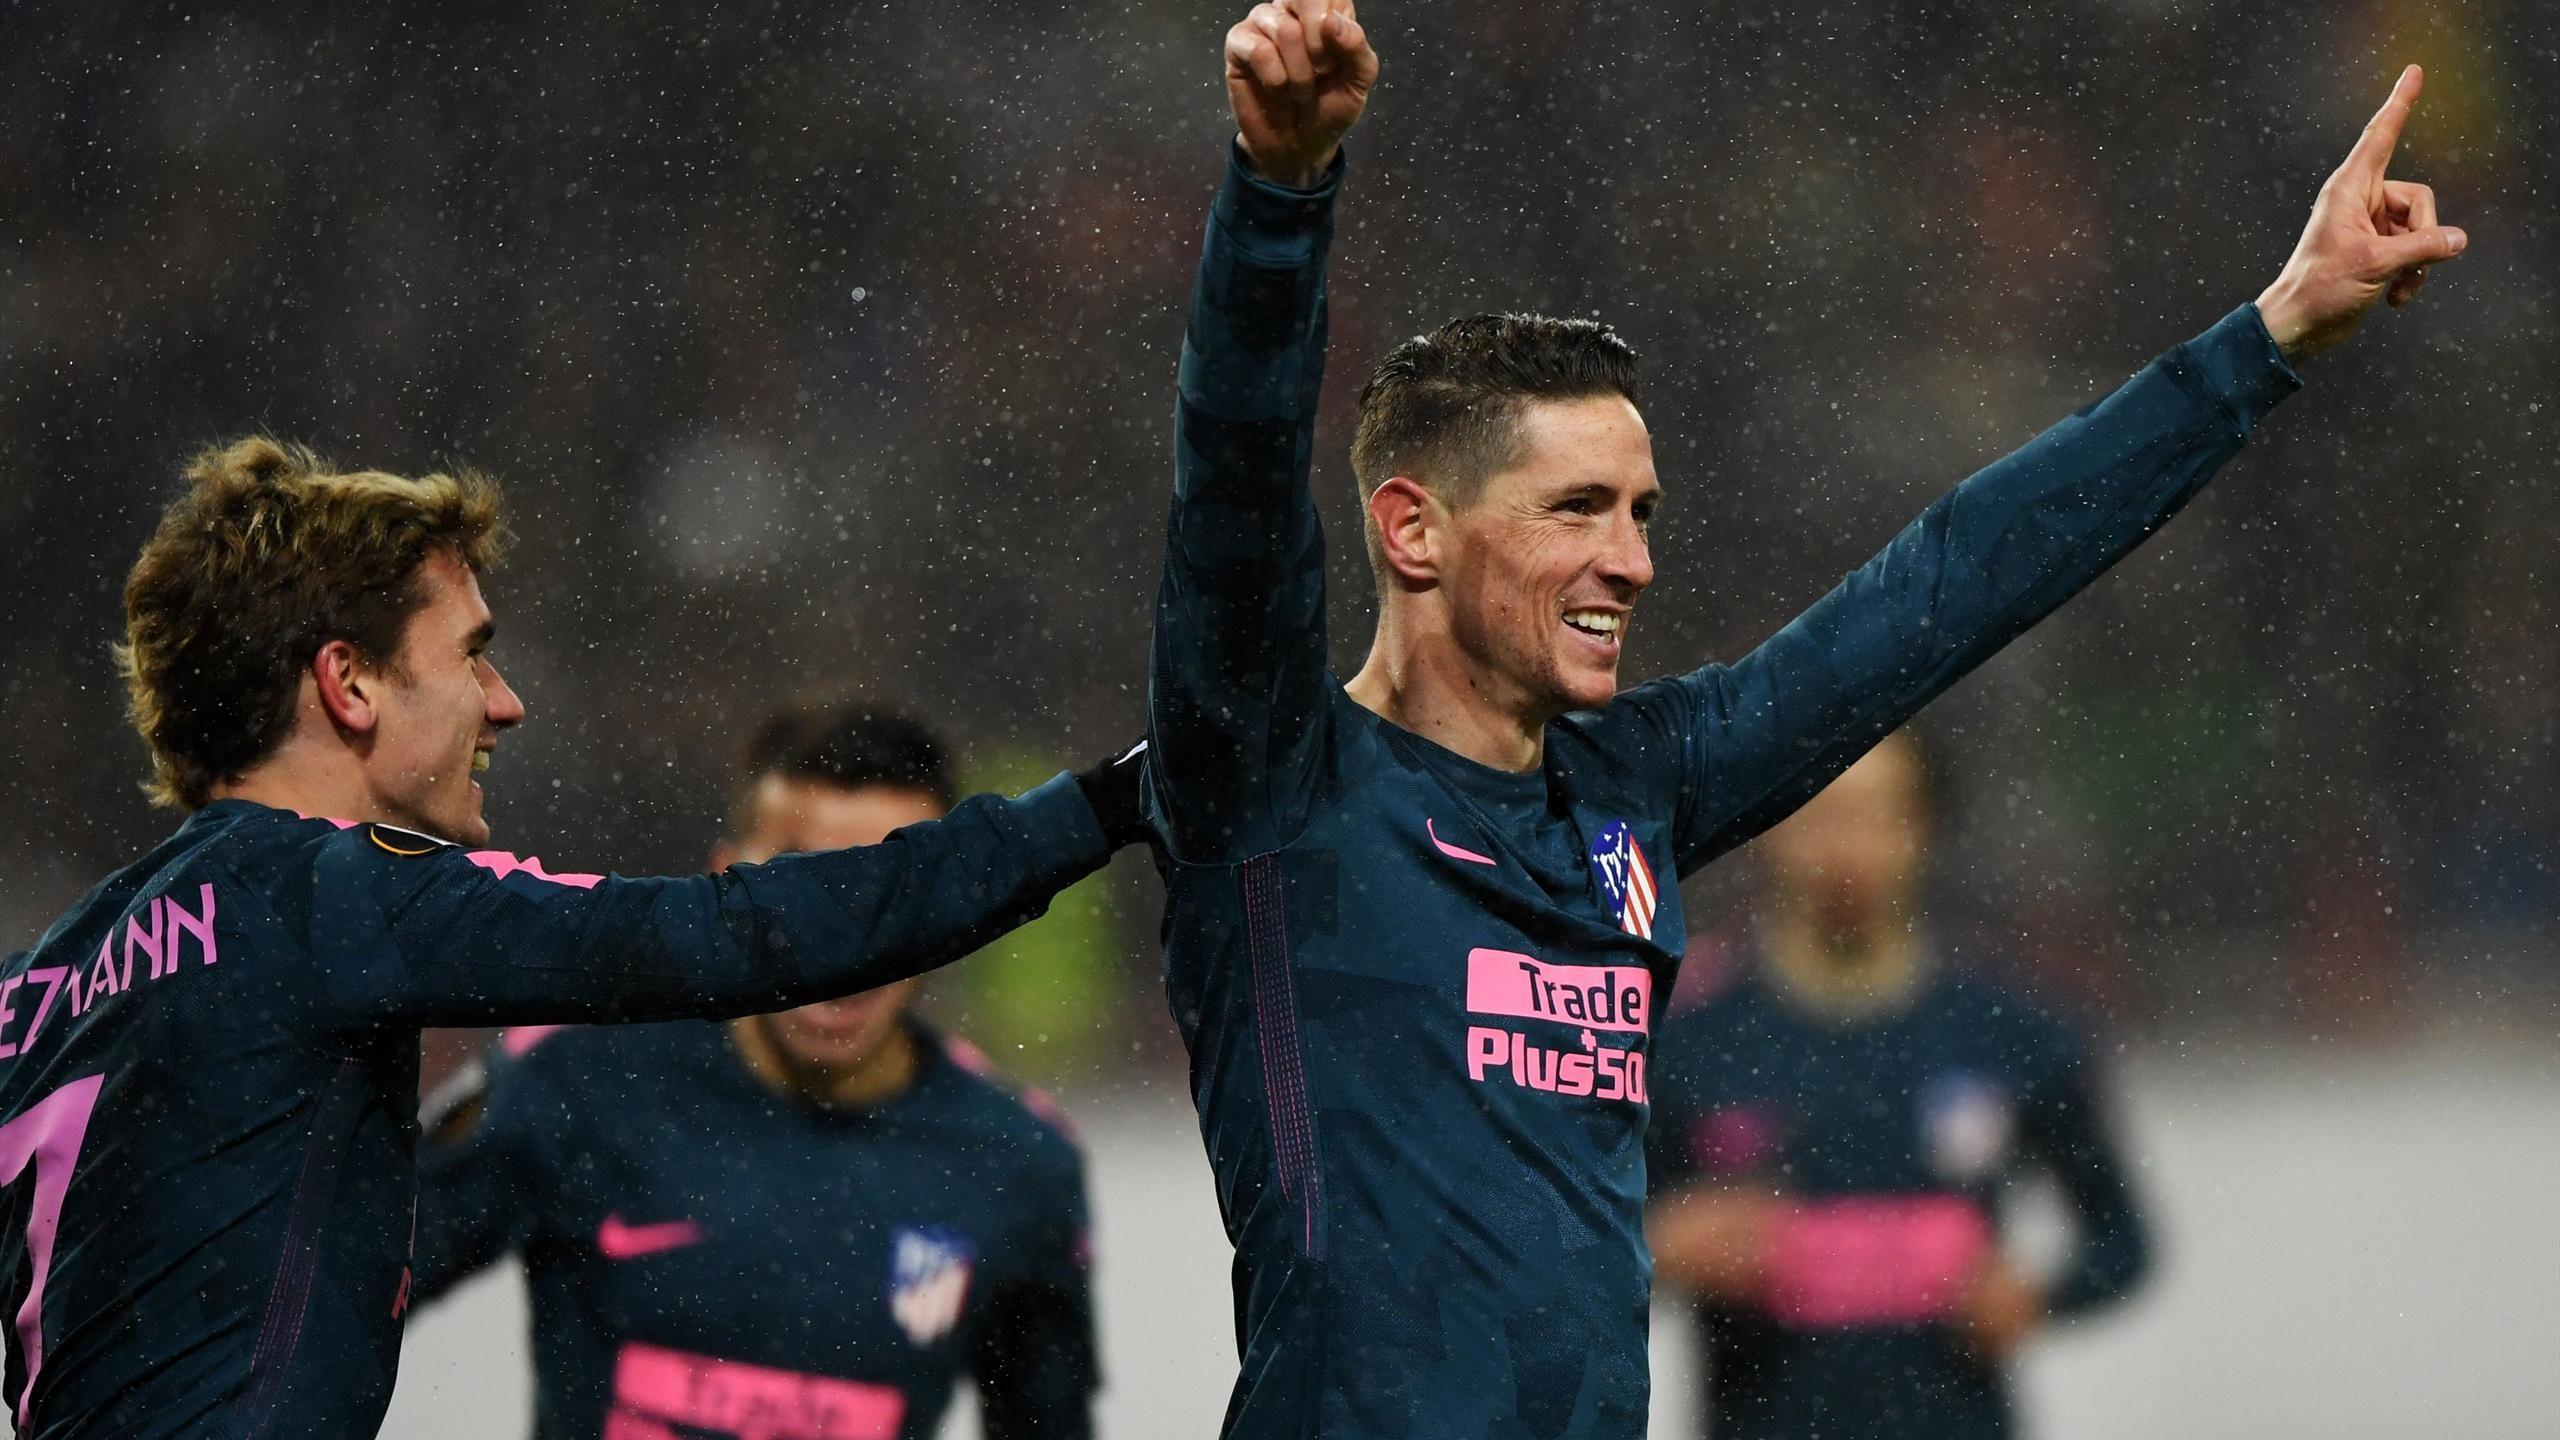 Прогноз на матч Вильярреал - Атлетико Мадрид 20 октября 2018